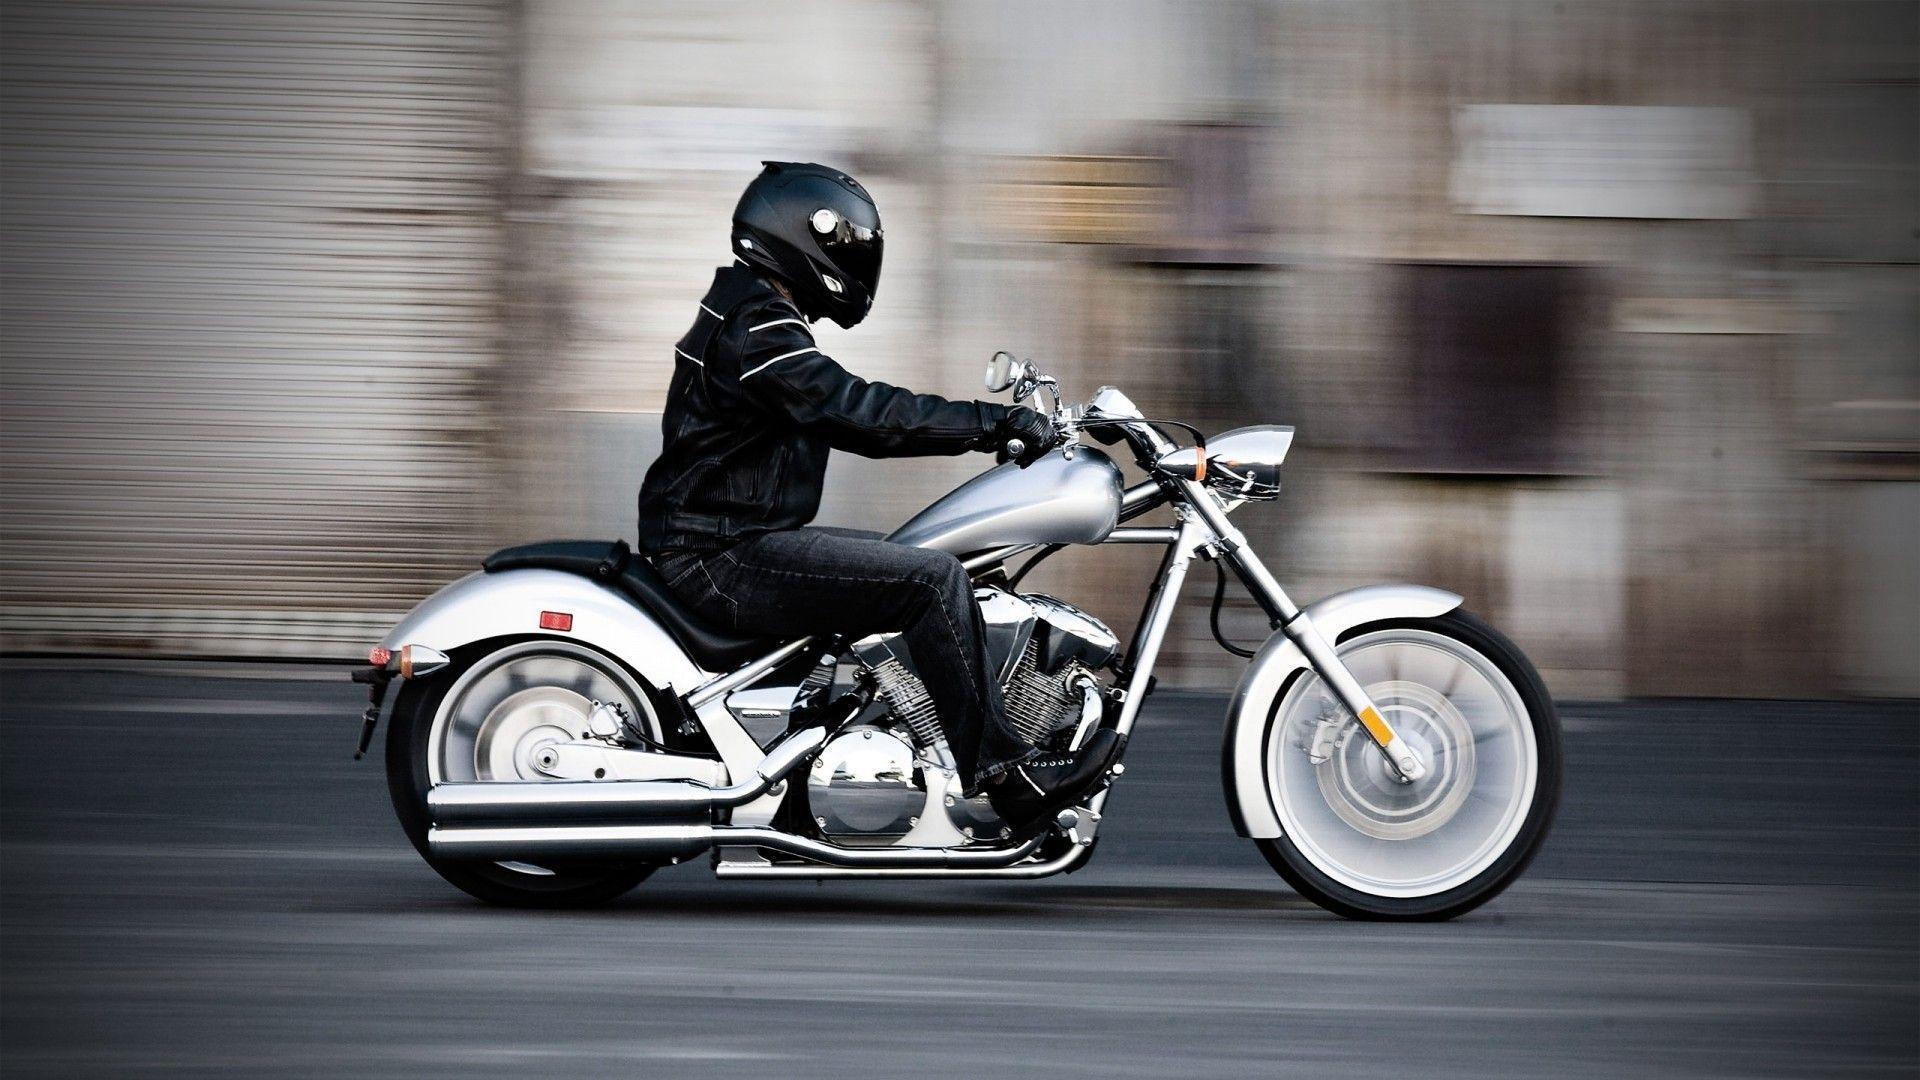 Harley Davidson Wallpaper Widescreen For Desktop | Harley Davidson ...